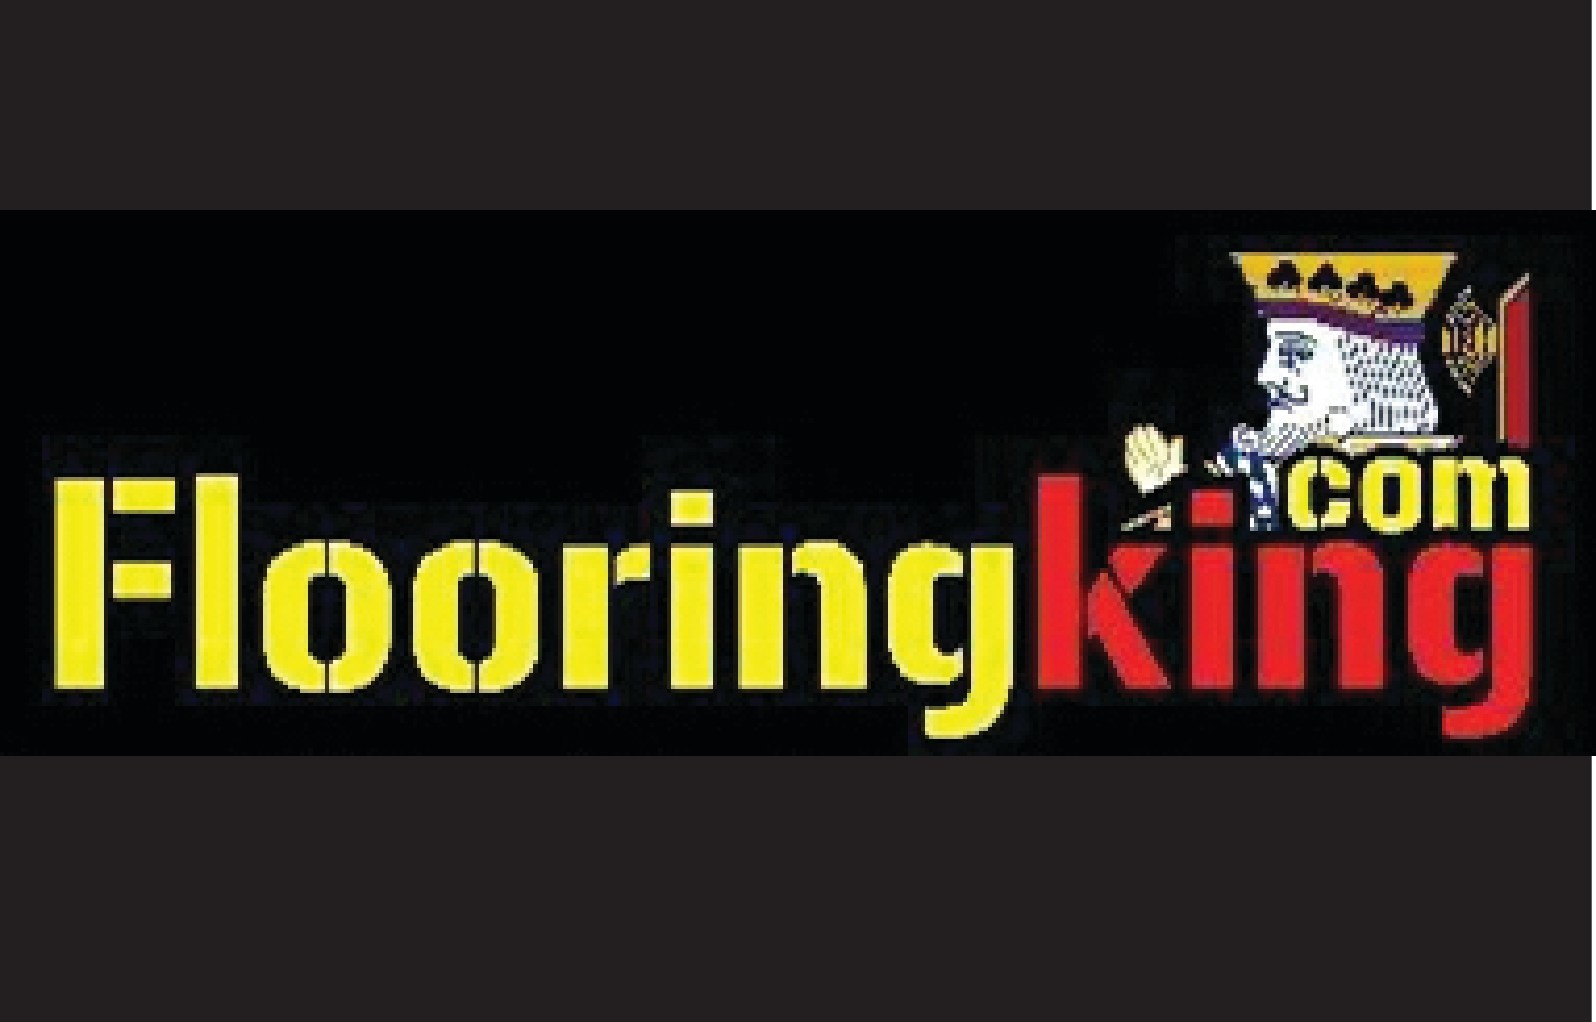 Flooring King is the world's largest flooring liquidator